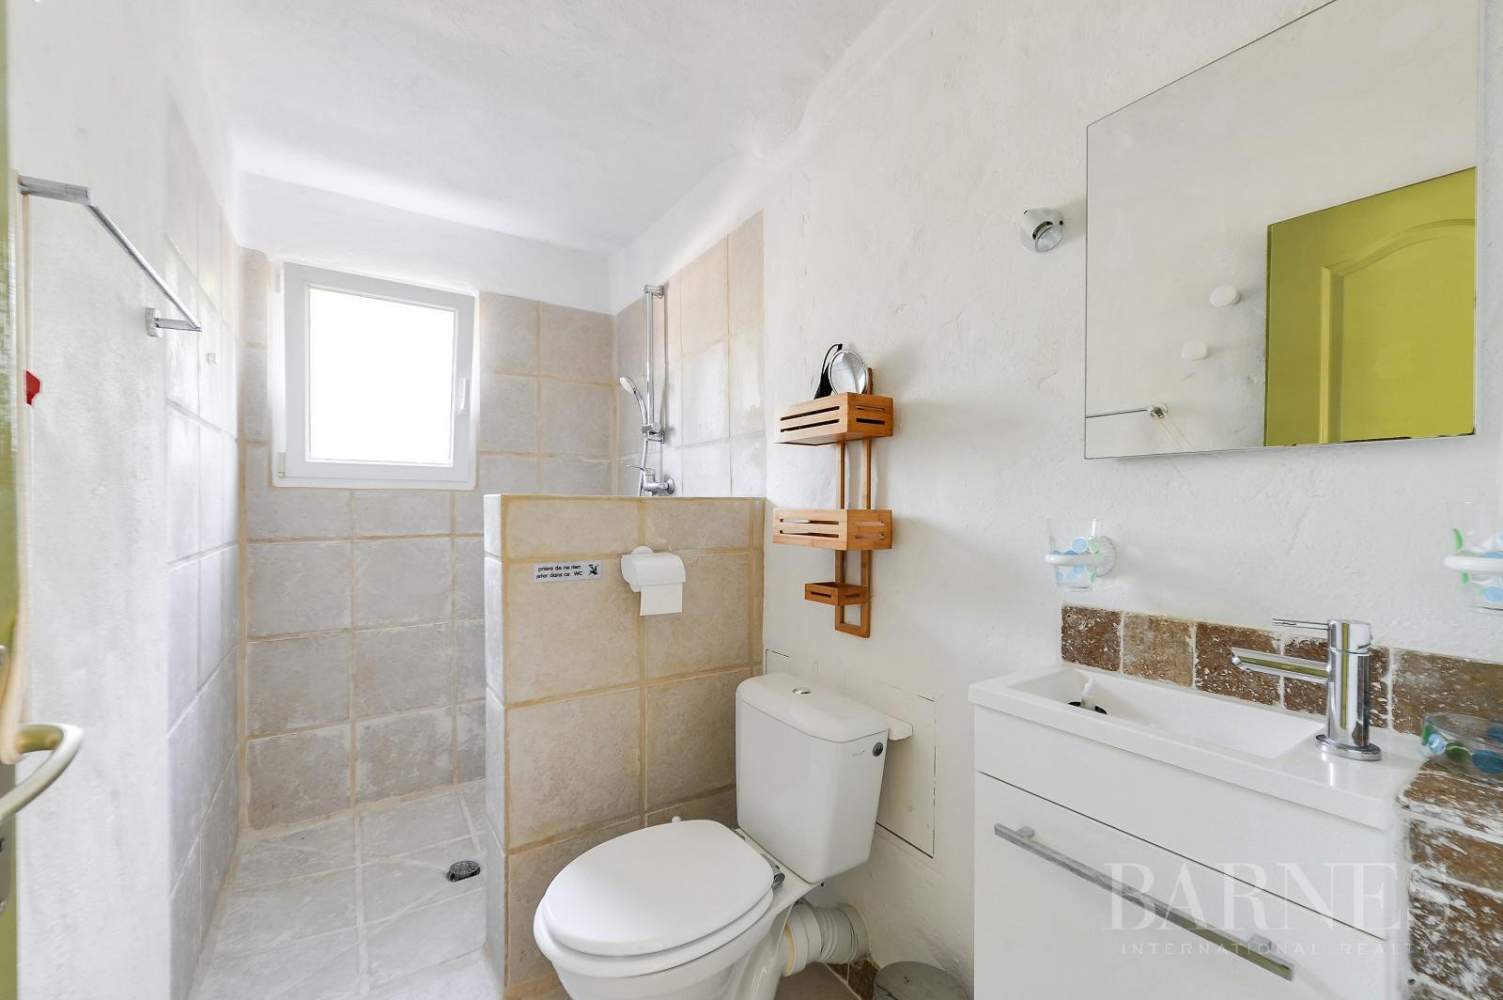 Sainte-Lucie-de-Porto-Vecchio  - Villa 3 Pièces 2 Chambres - picture 9